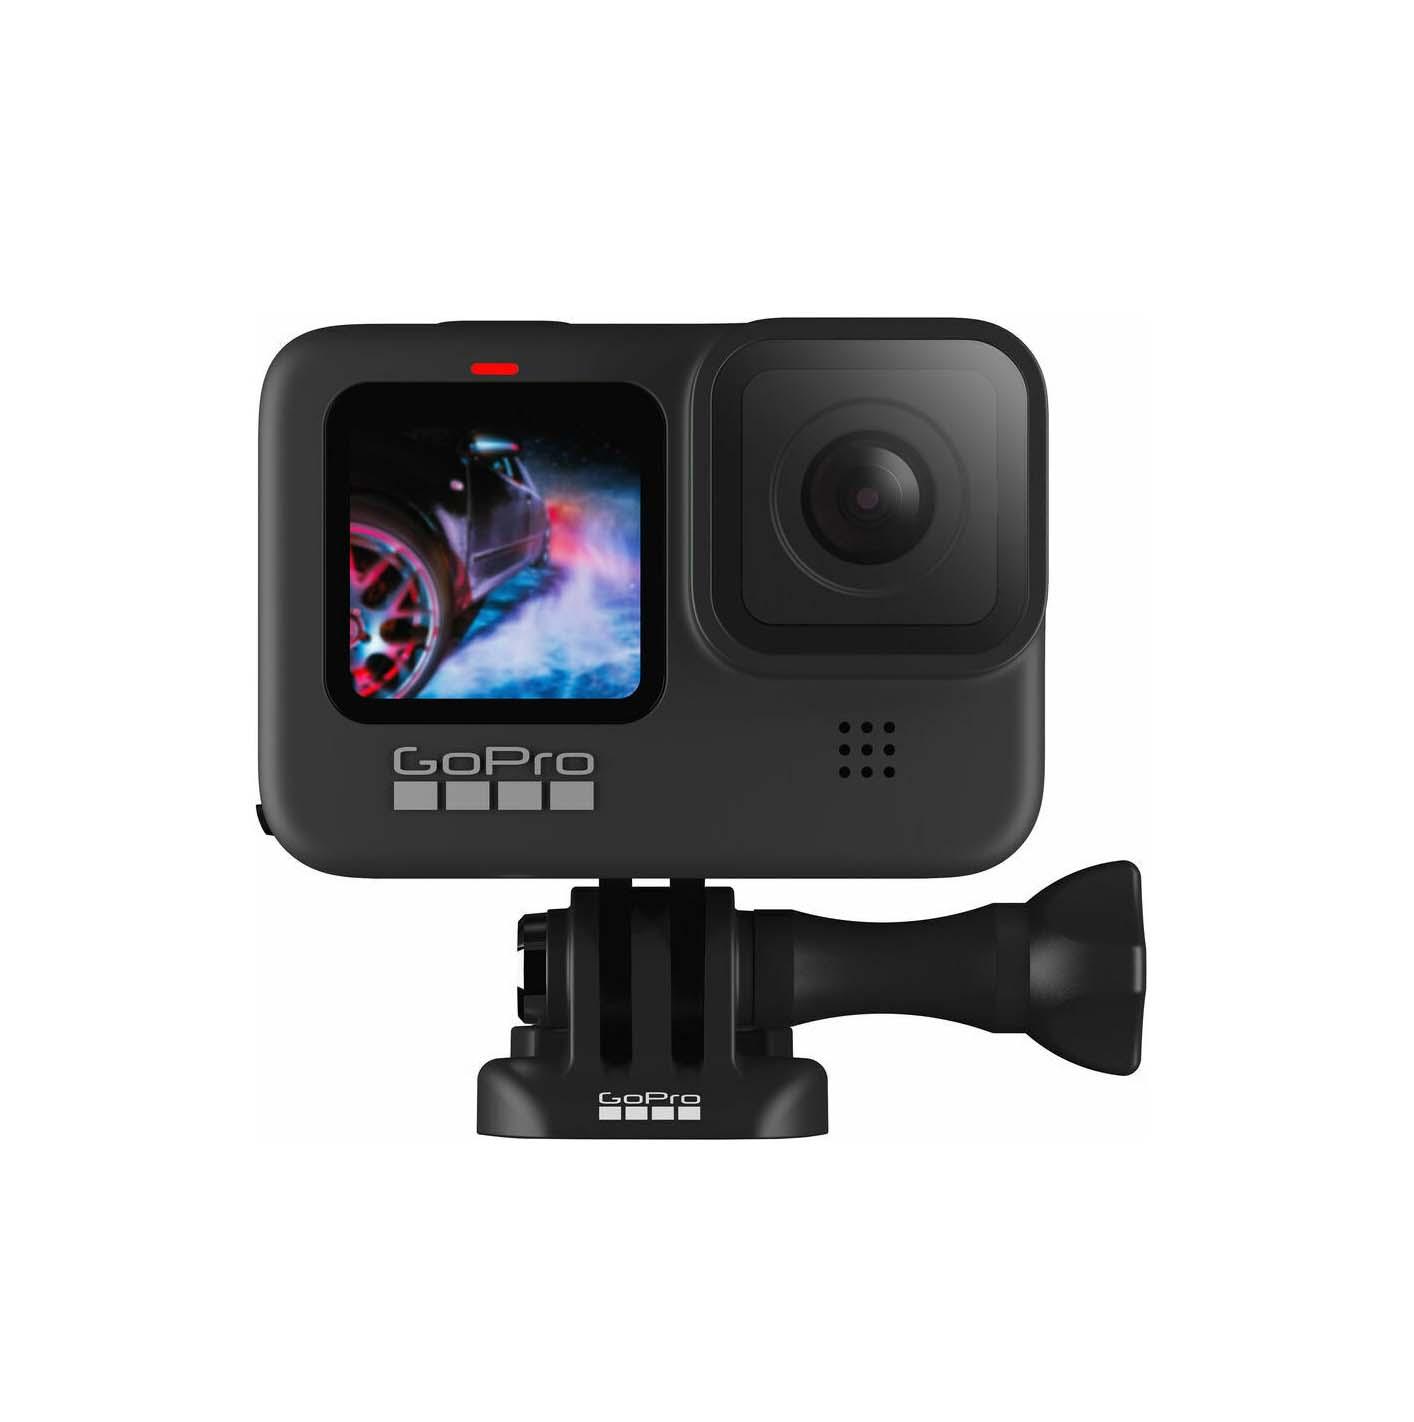 GoPro Hero9 Action Camera Black CHDHX-901-RW Πληρωμή έως 24 δόσεις